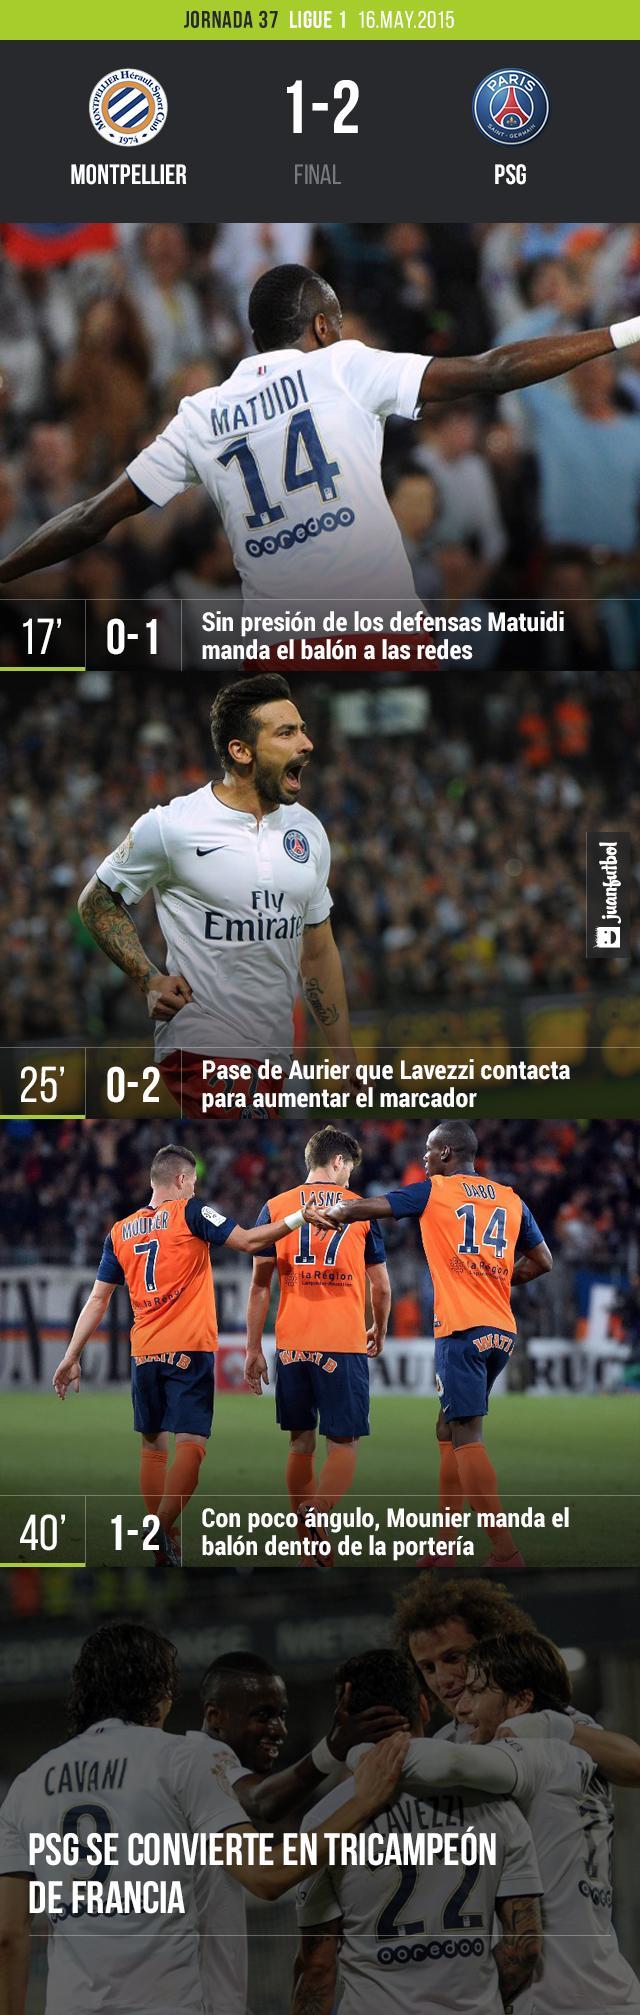 PSG se coronó campeón en la Ligue 1 tras vencer 2-1 a Montpellier con goles de Lavezzi y Matuidi